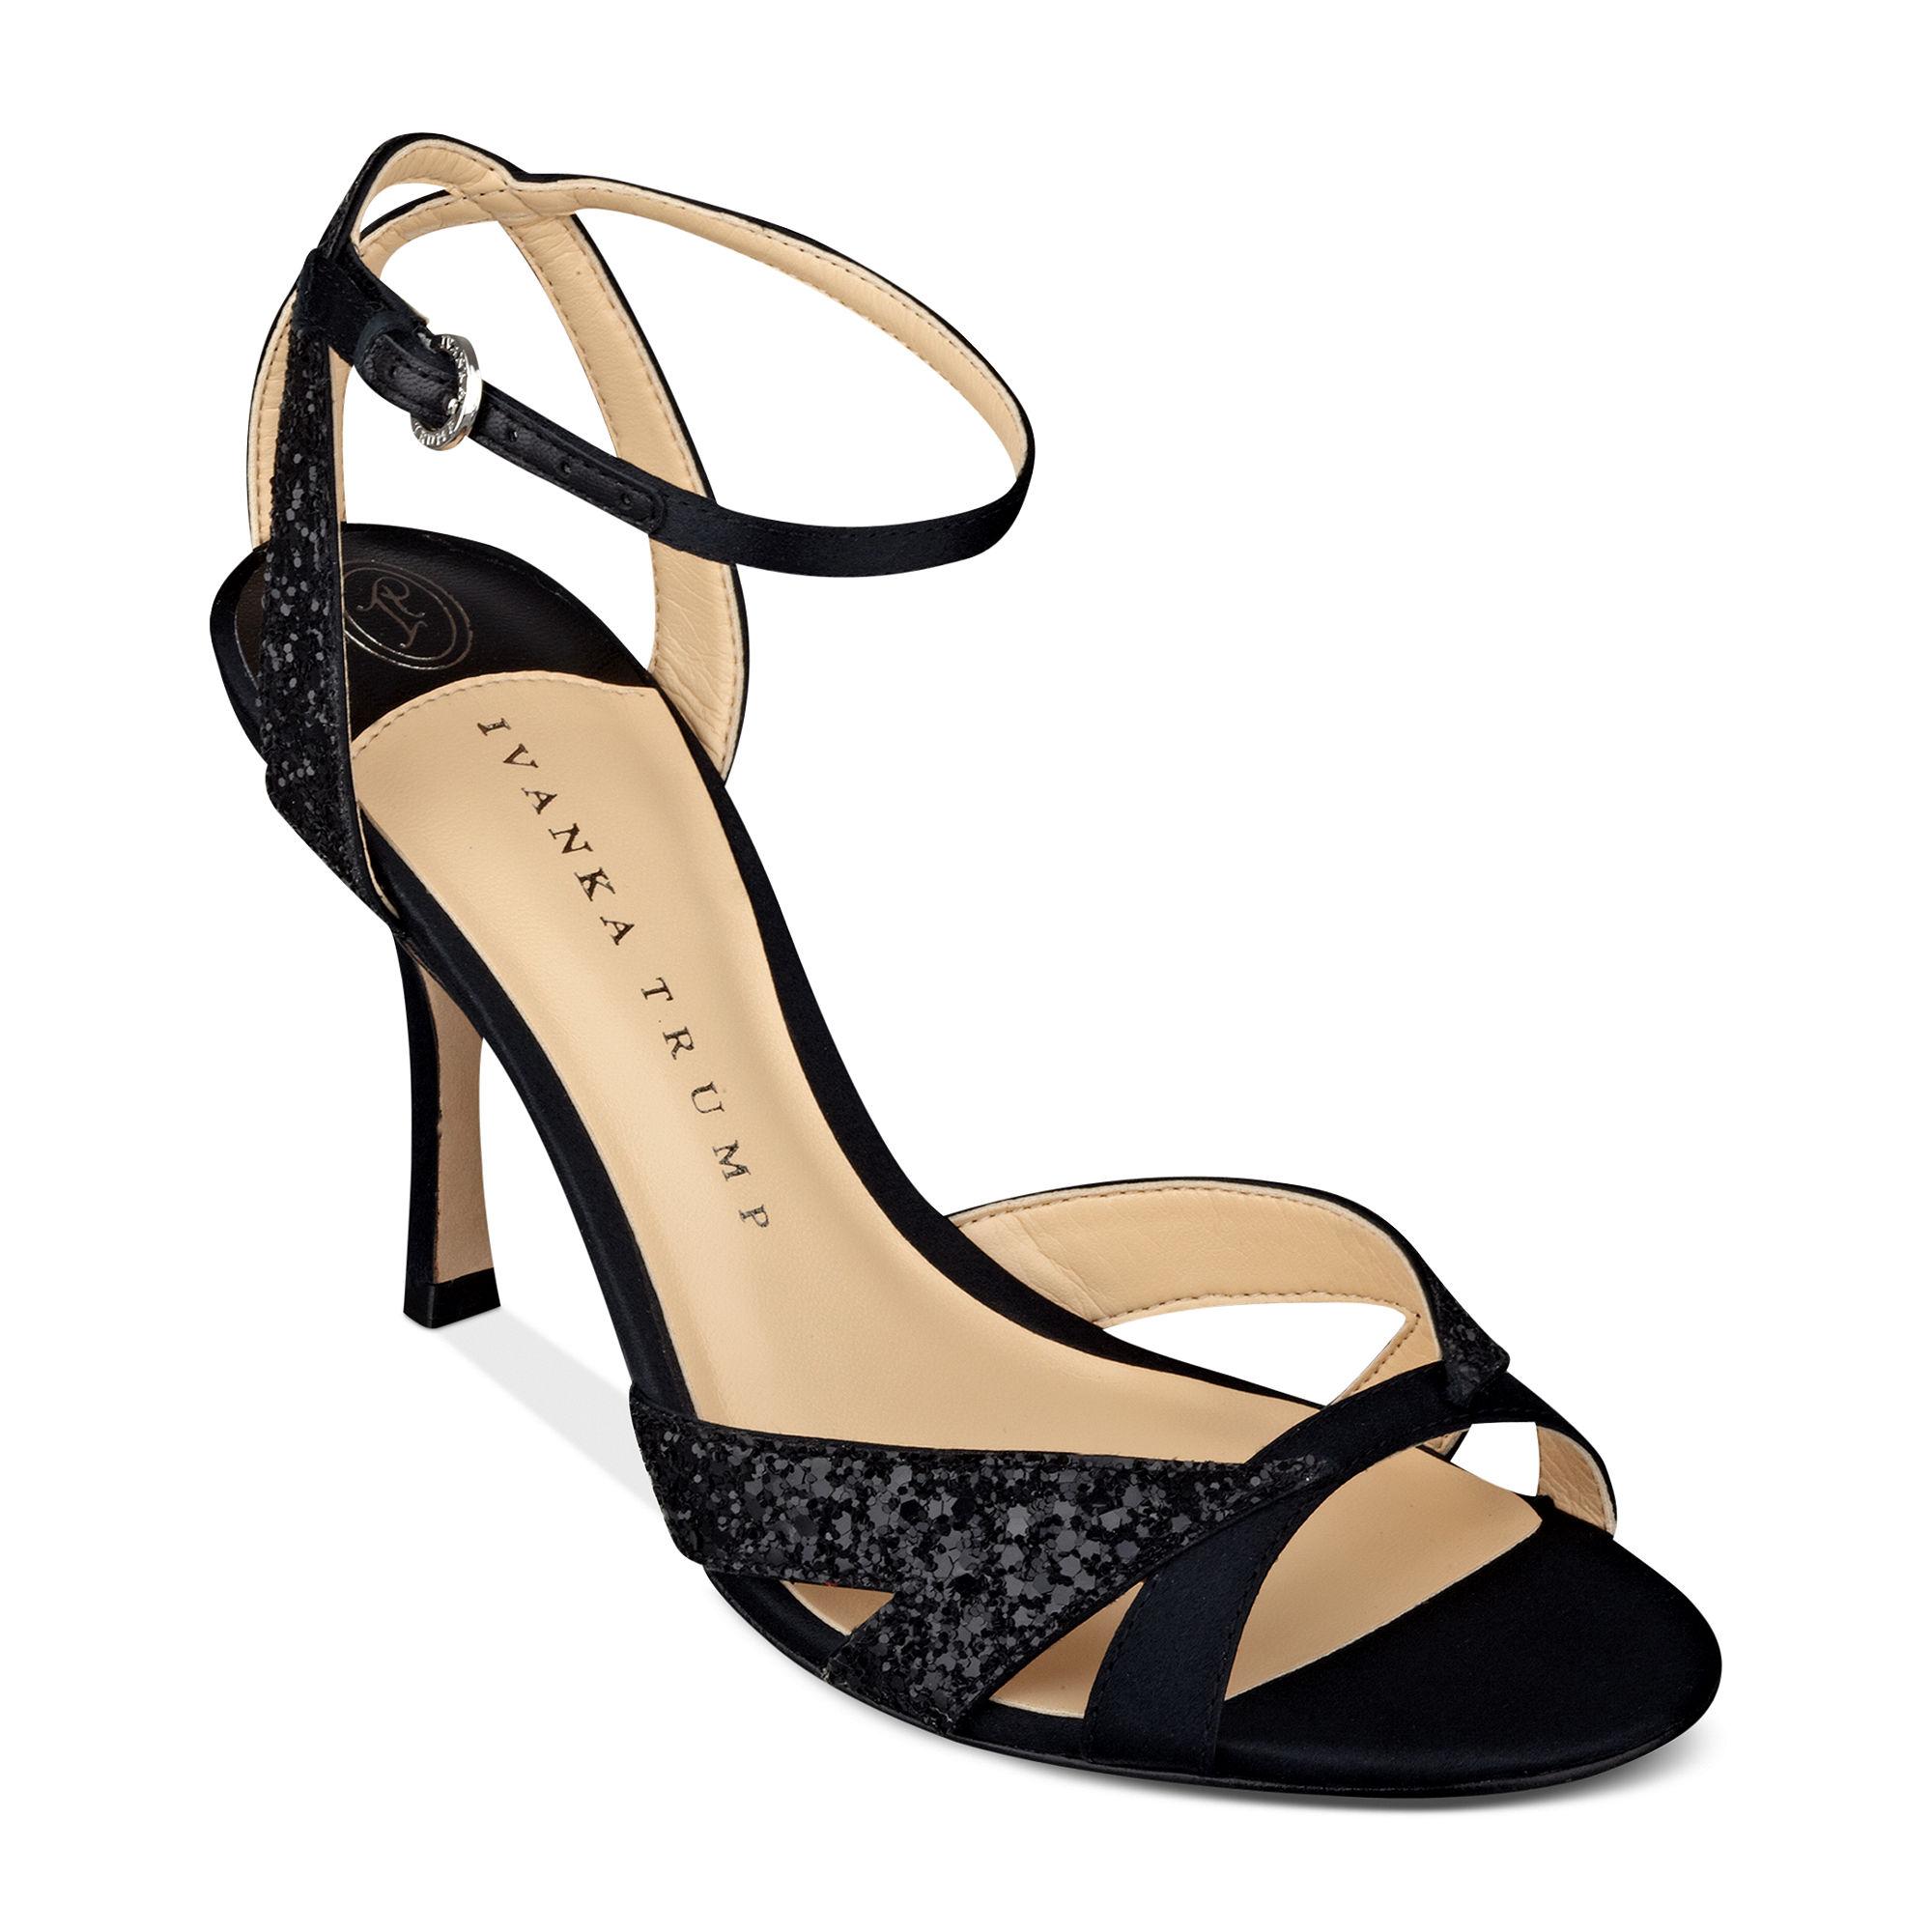 25f81dcefe4 Ivanka Trump Black Anita Mid Heel Evening Sandals